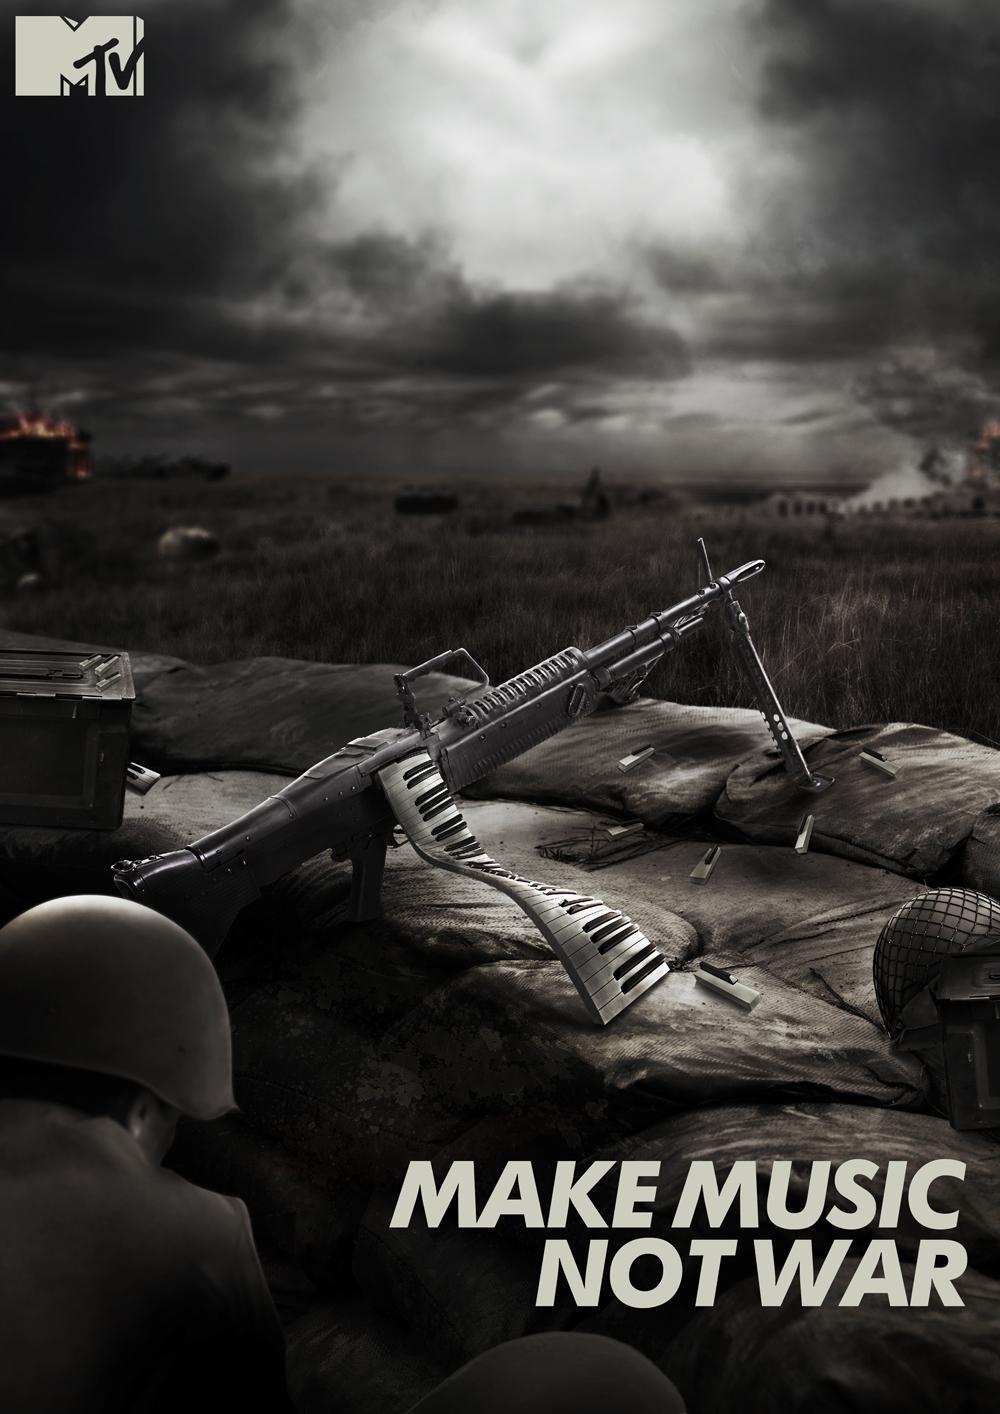 MTV INDIA - MAKE MUSIC NOT WAR on Behance